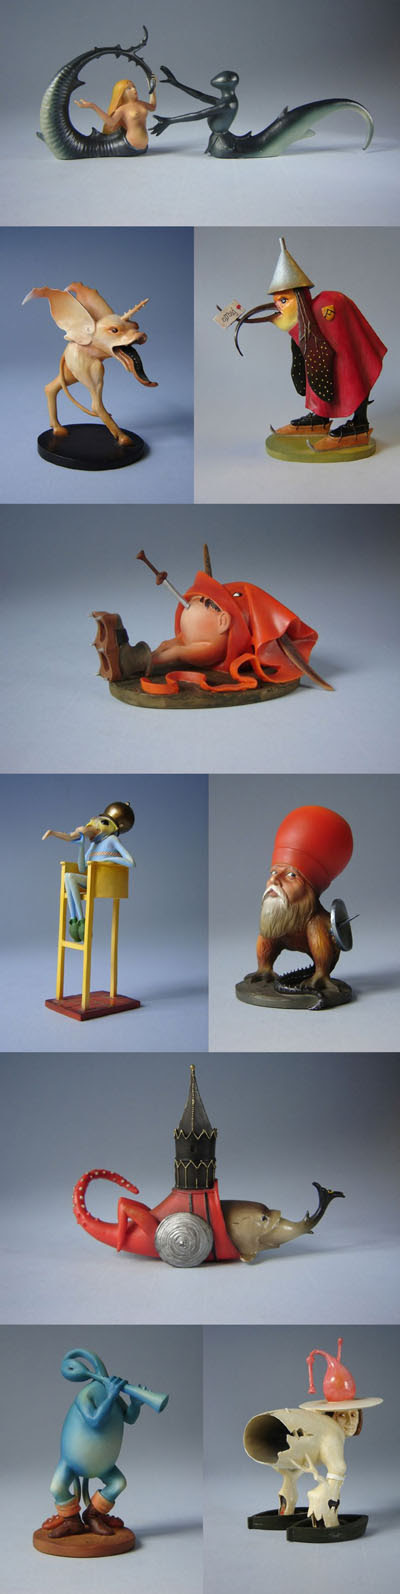 Hieronymus Bosch figurines